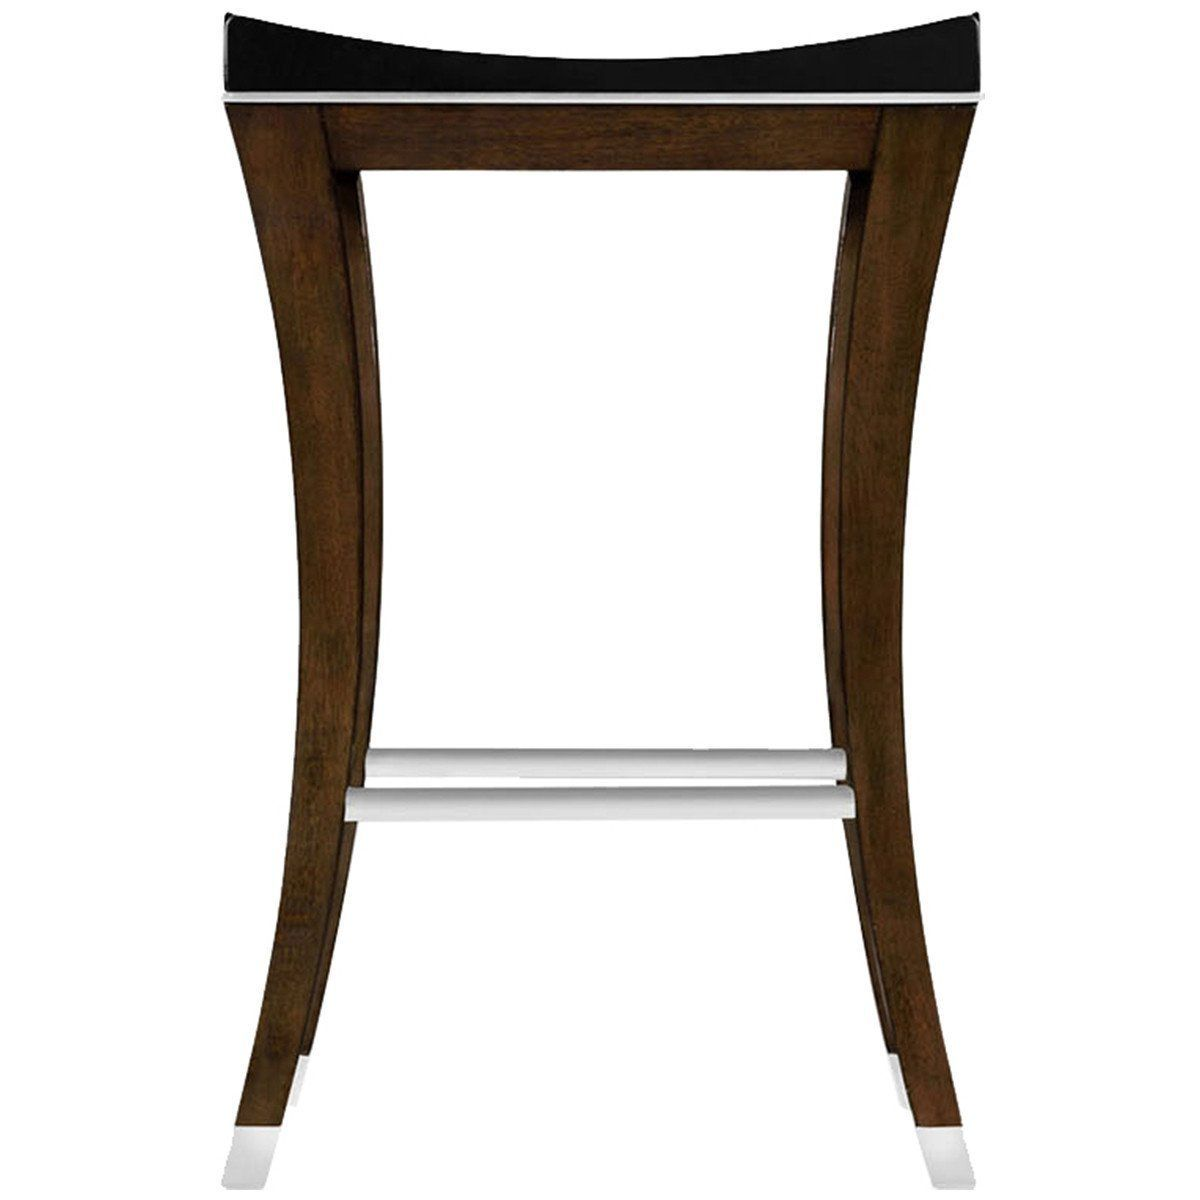 Terrific Jonathan Charles Comfortably Modern Counter Stool Products Inzonedesignstudio Interior Chair Design Inzonedesignstudiocom